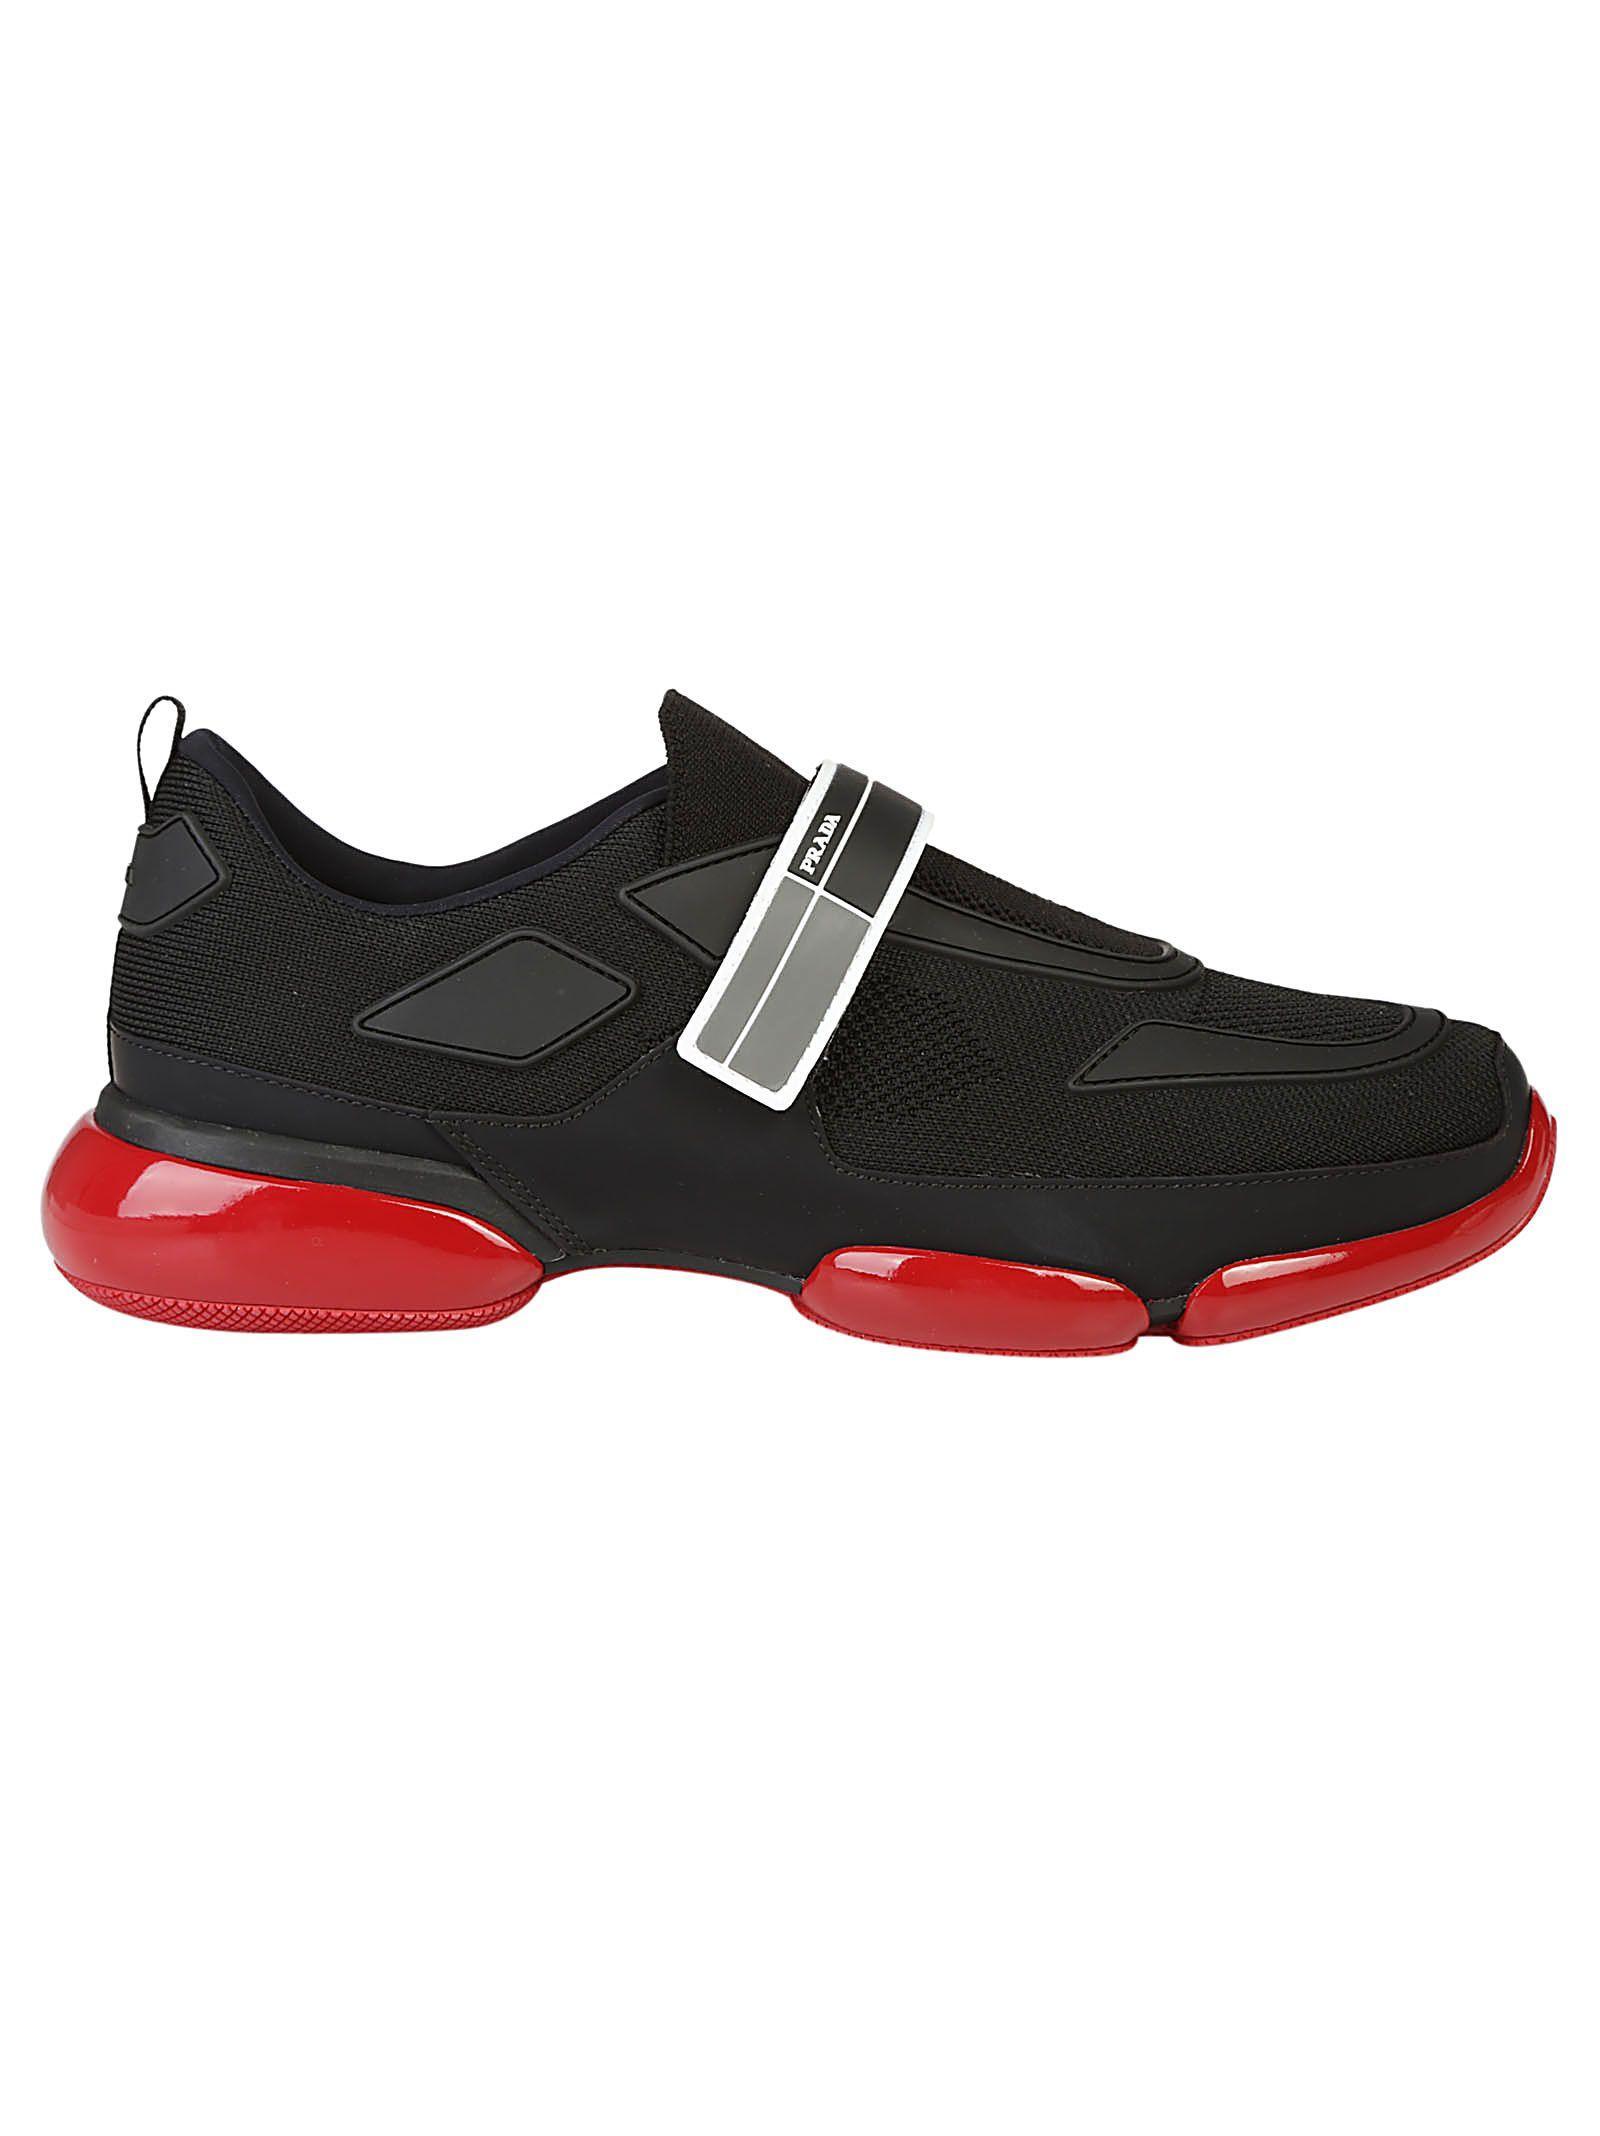 Prada Sneakers In Nero+fumo